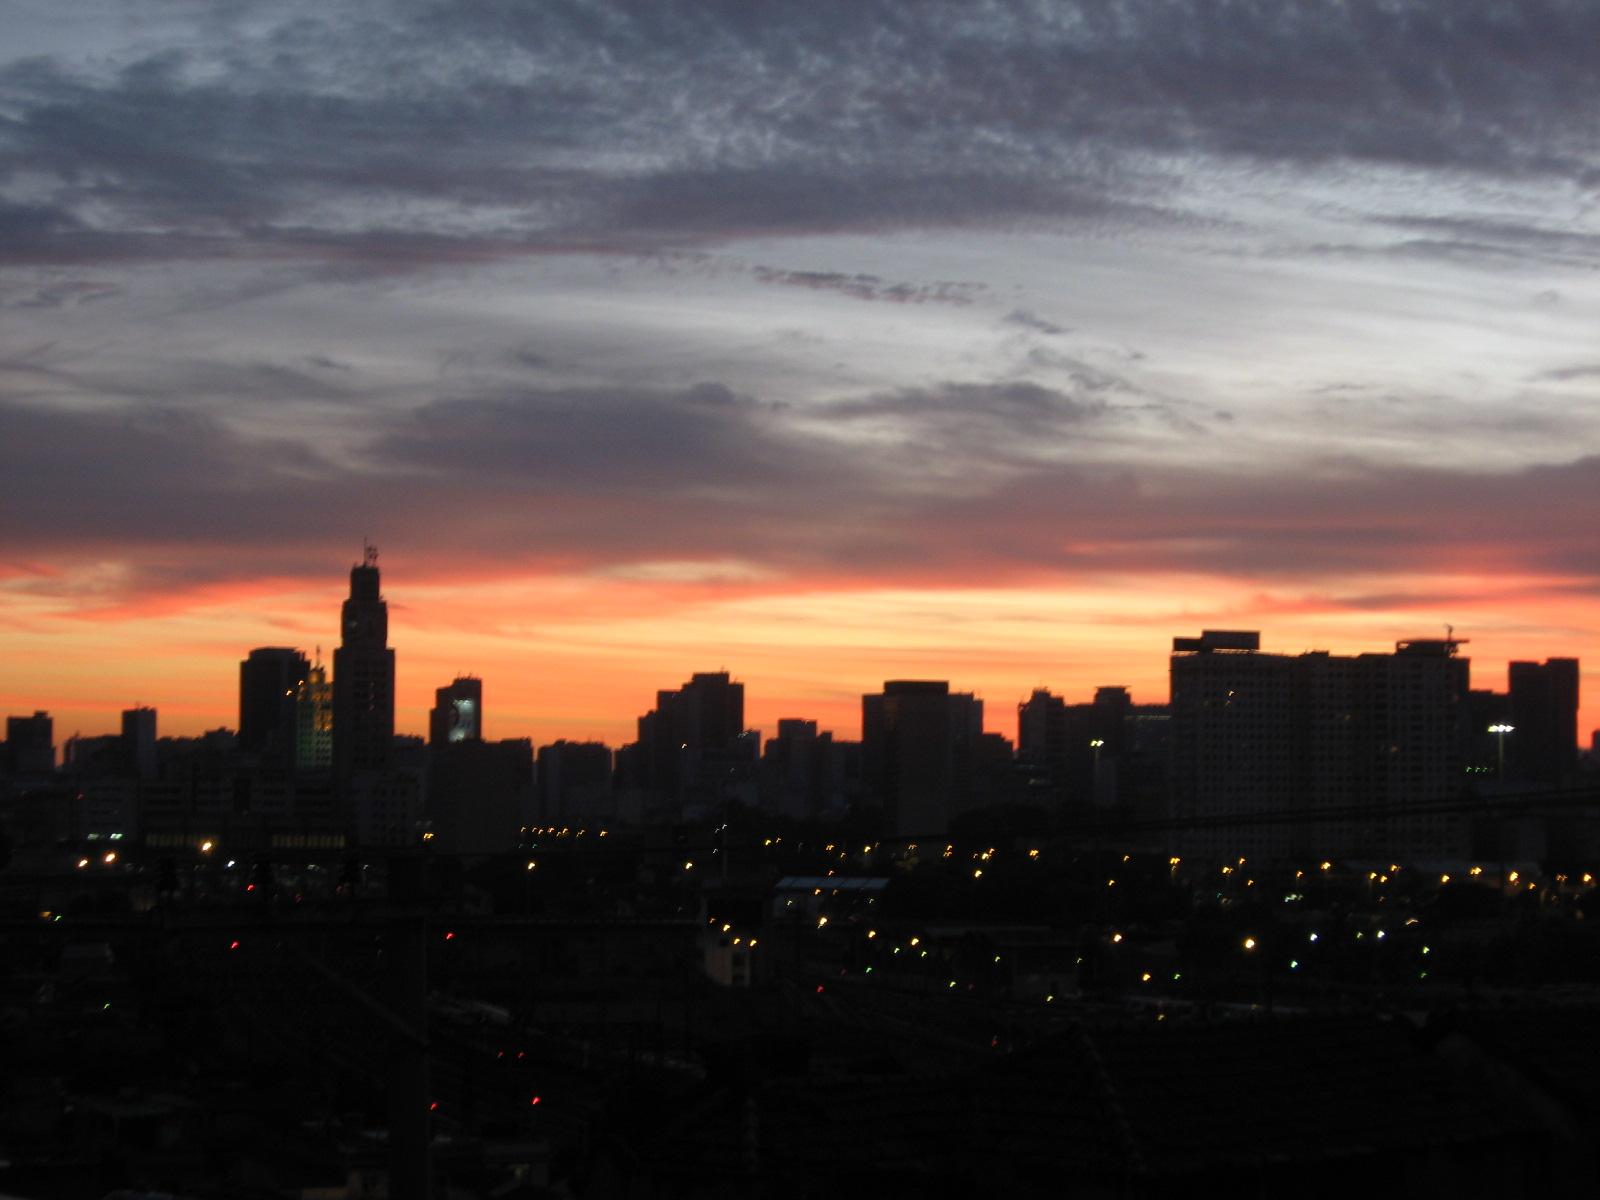 Sunset, Buildings, City, Clouds, Colors, HQ Photo